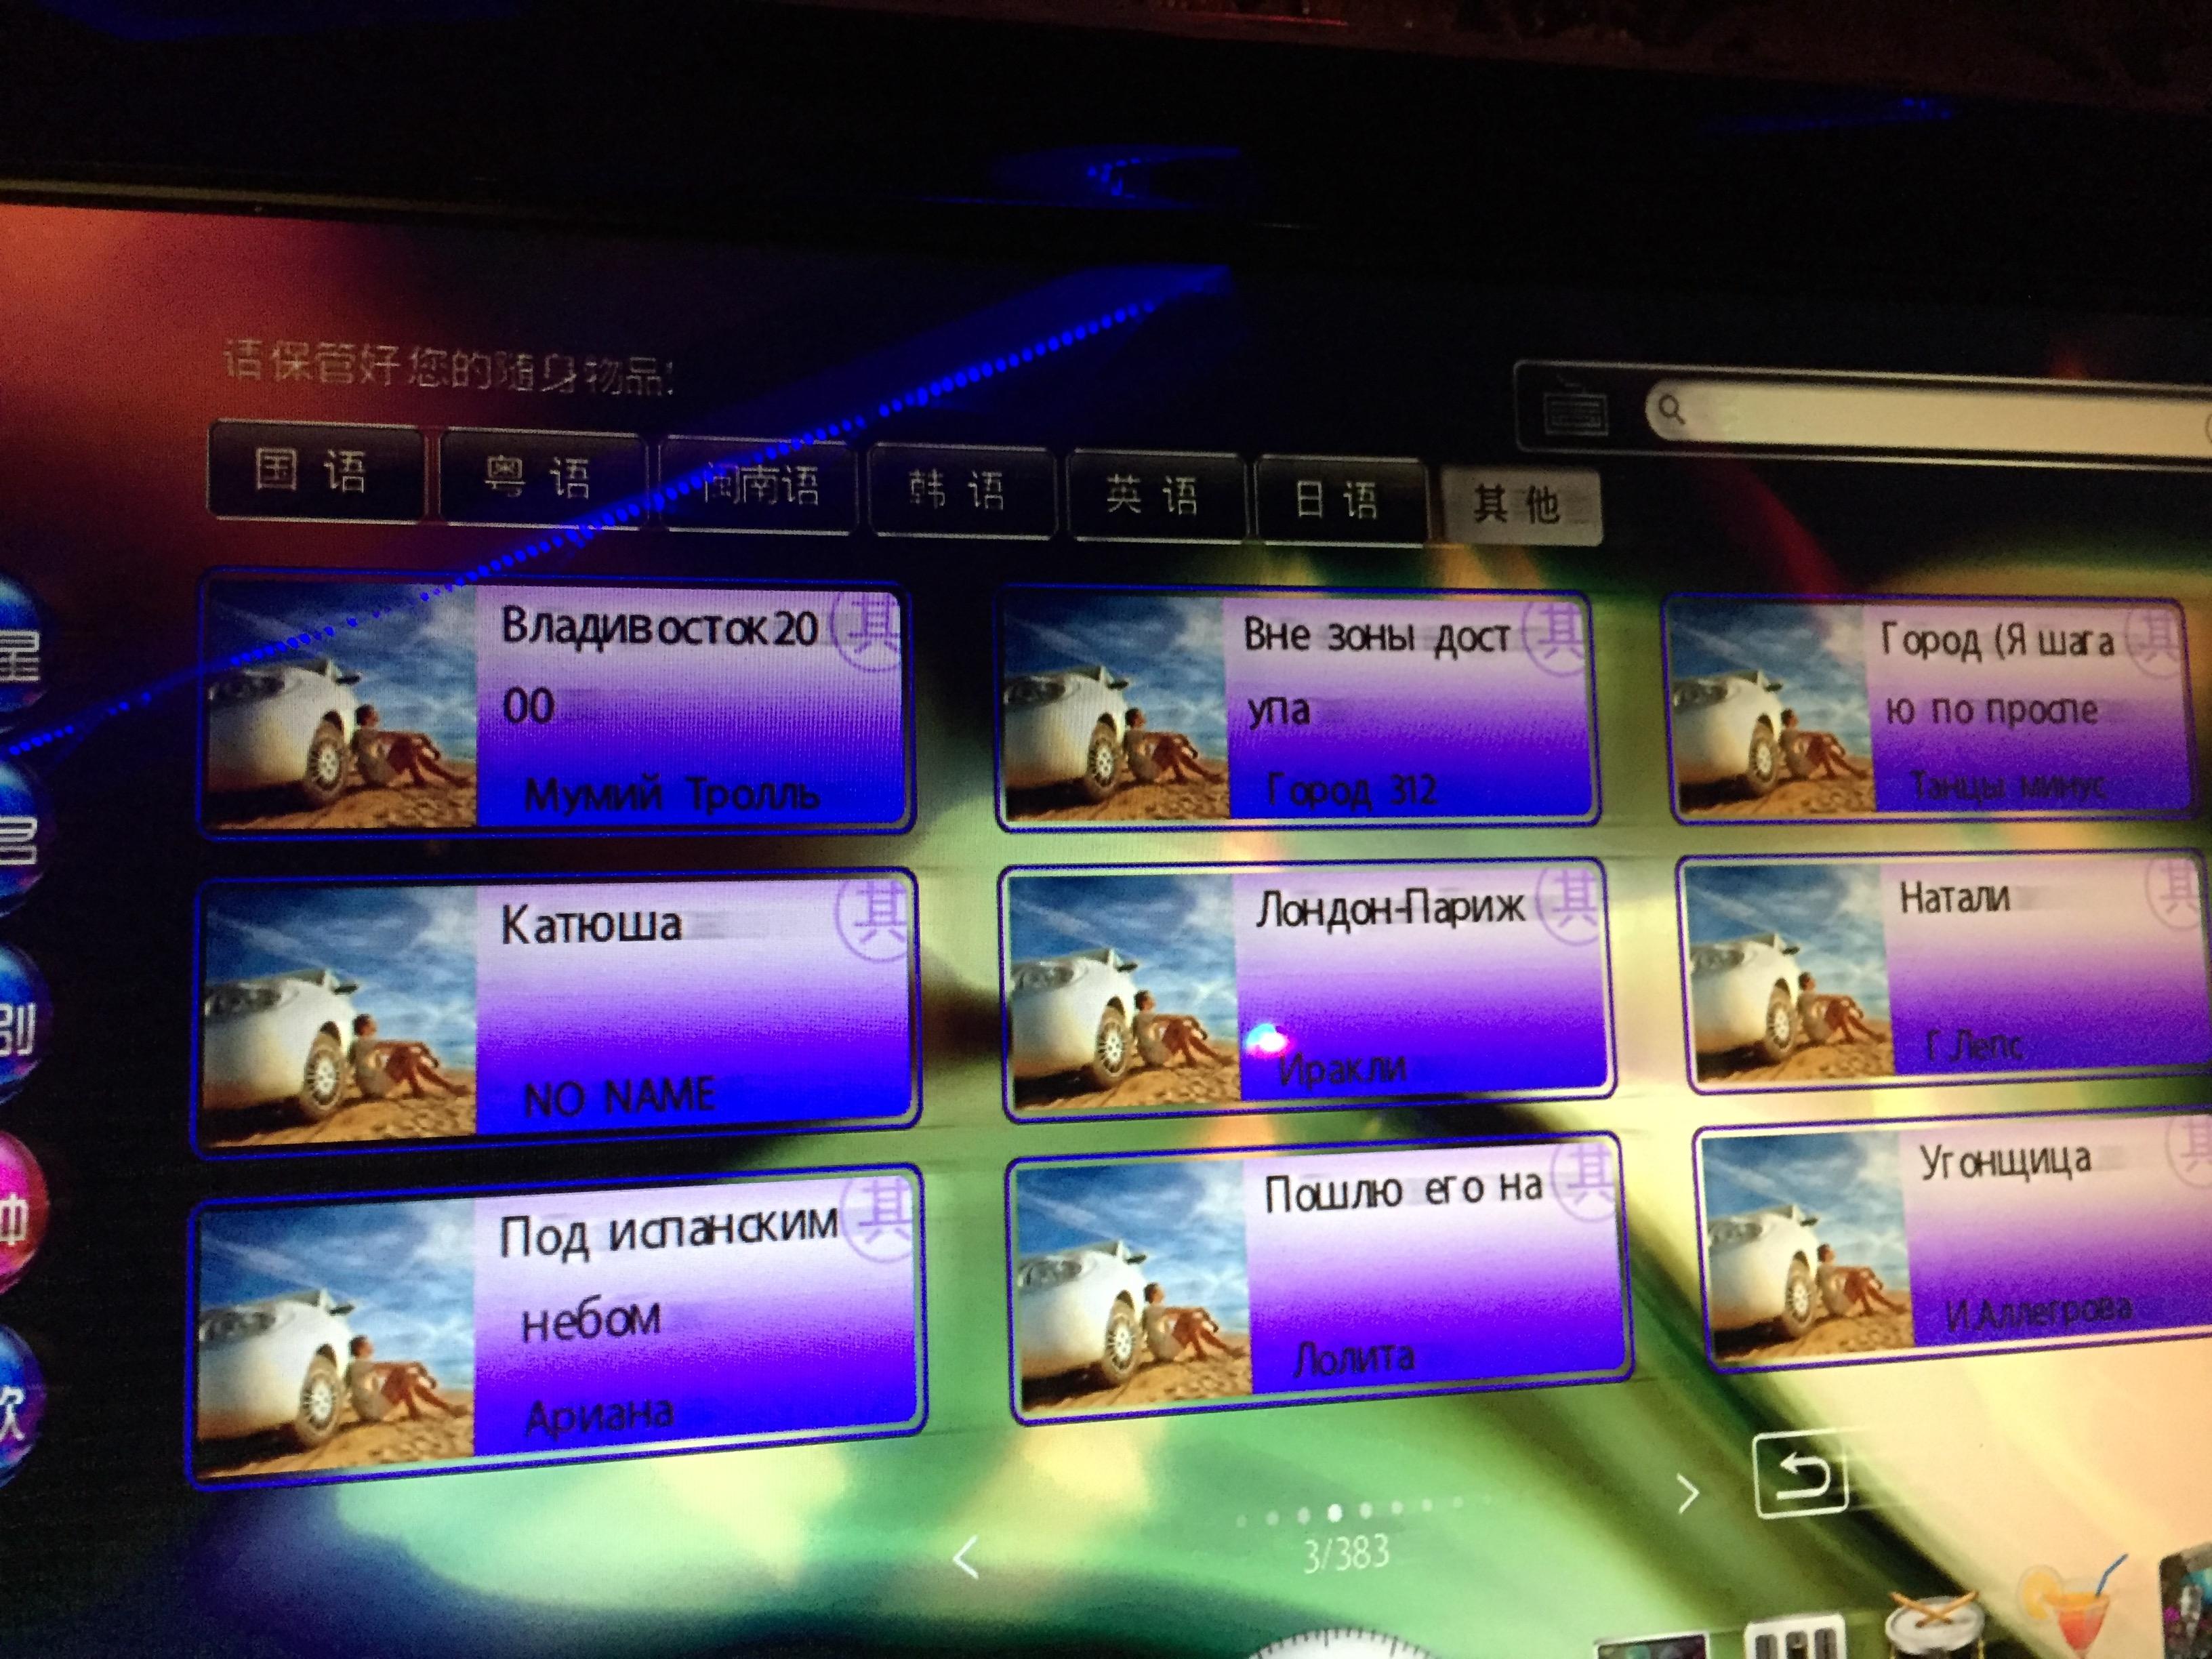 Каталог в китайских караоке KTV